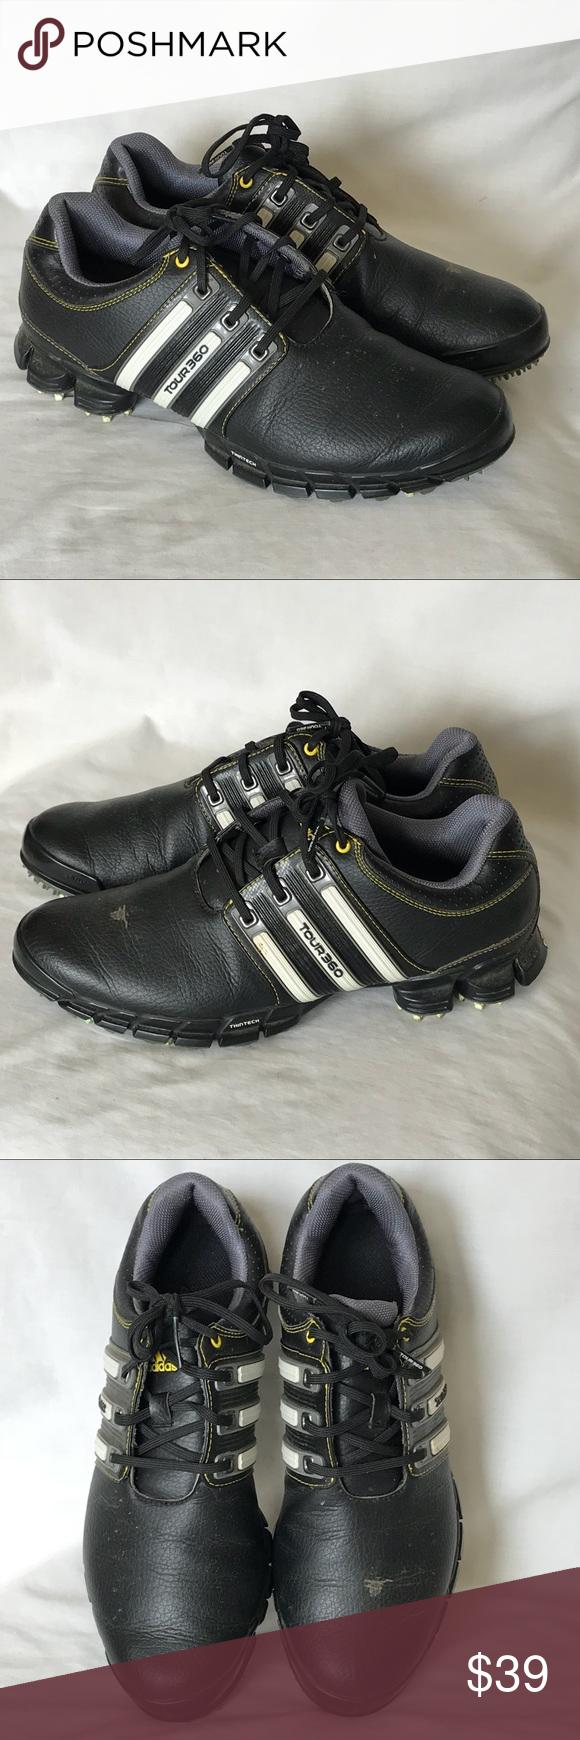 Adidas Tour 360 Black White Golf Shoes 360 Sz Adidas tour 360 Shoes 8f7407